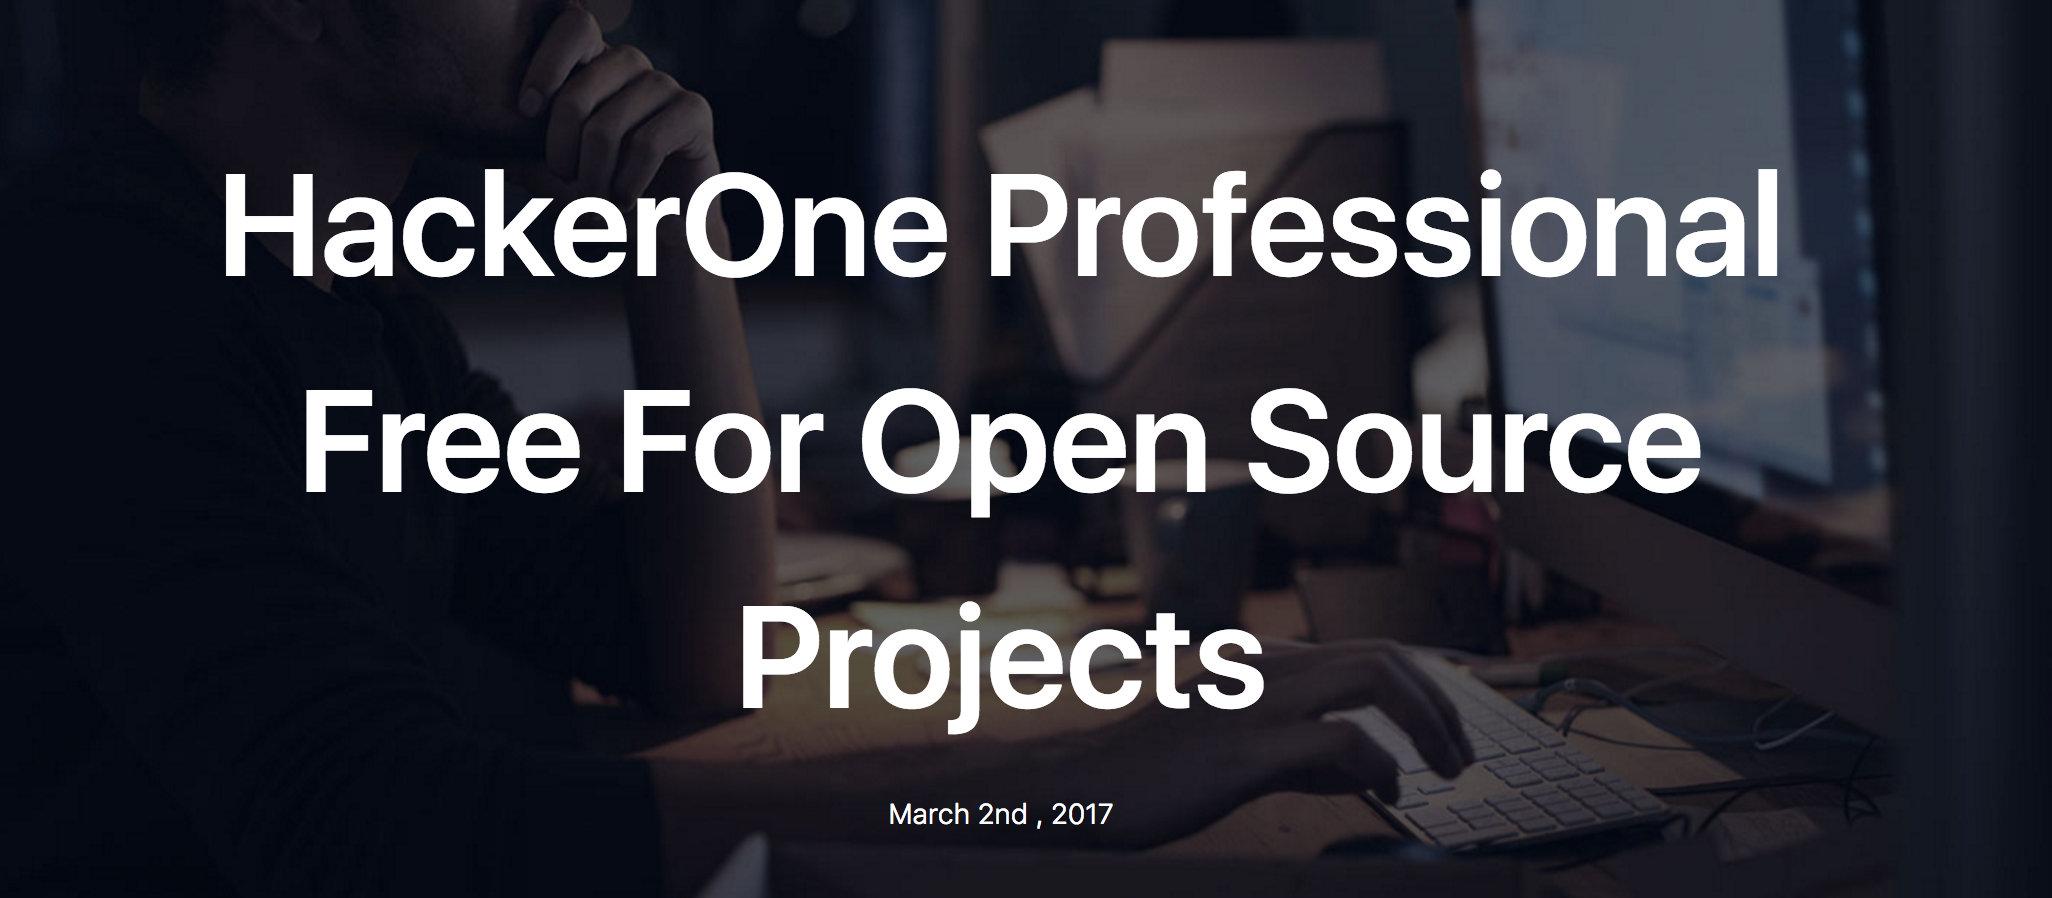 HackerOne將免費幫符合資格的開源碼專案抓漏 | iThome